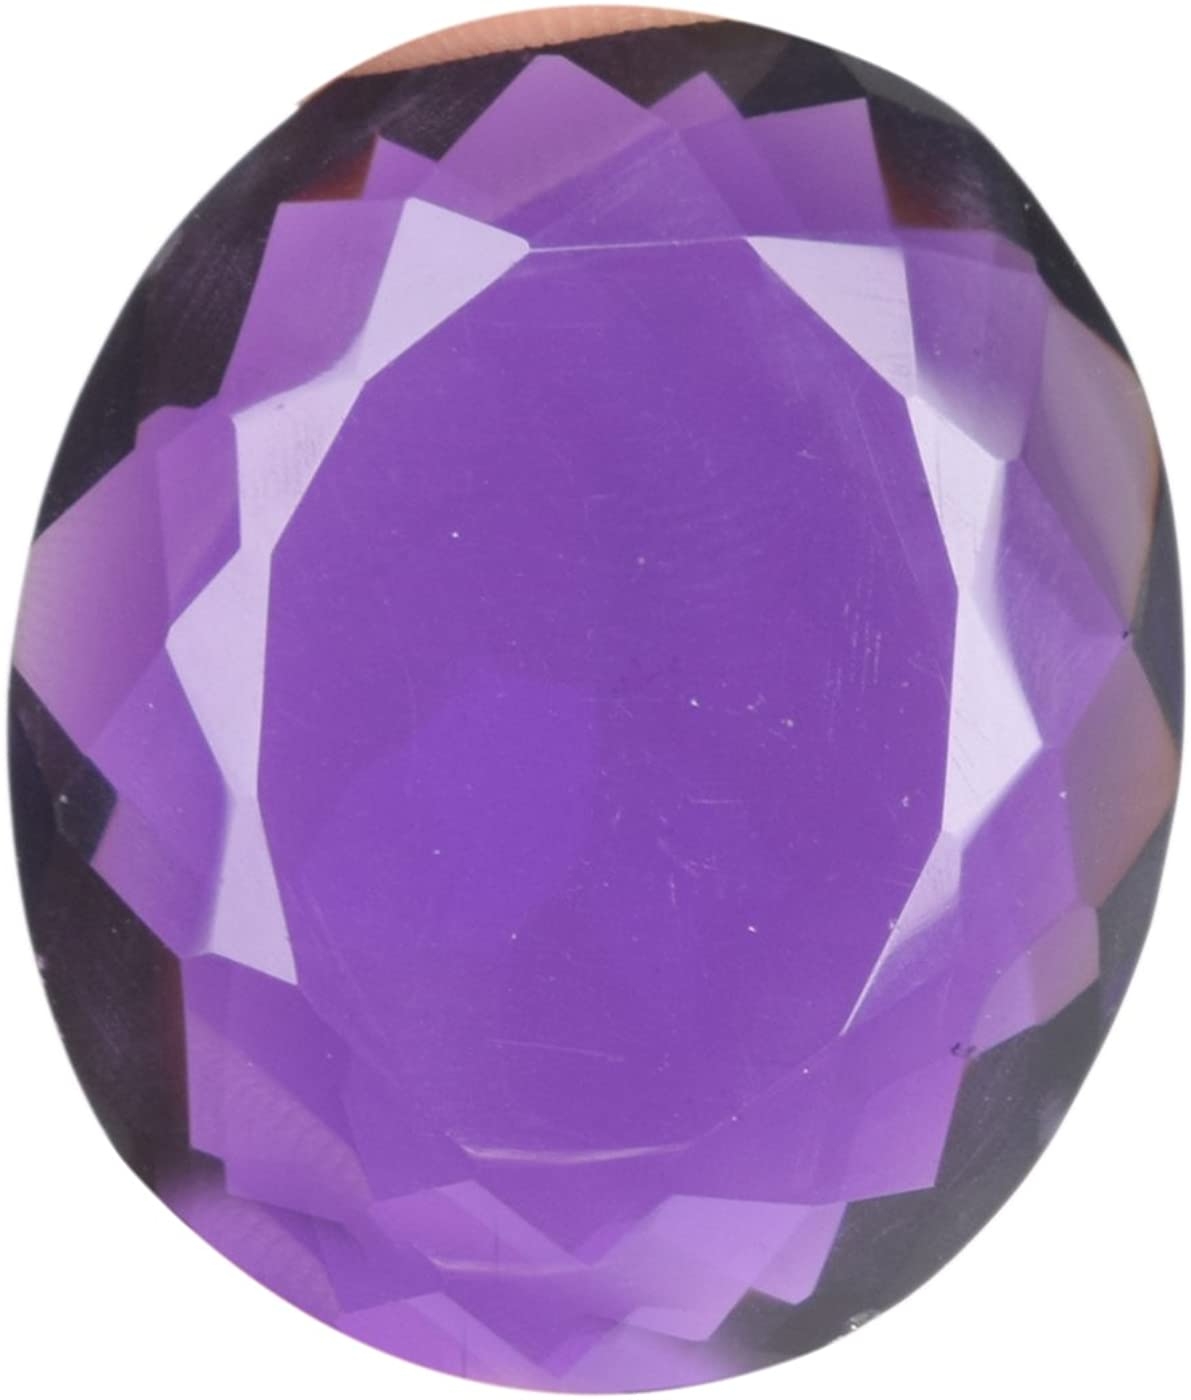 Gemhub Hermosa Amatista Violeta 76.95 CT Tamaño Colgante Violeta Amatista, Corte Ovalado Violeta Amatista Piedra Suelta BM-463